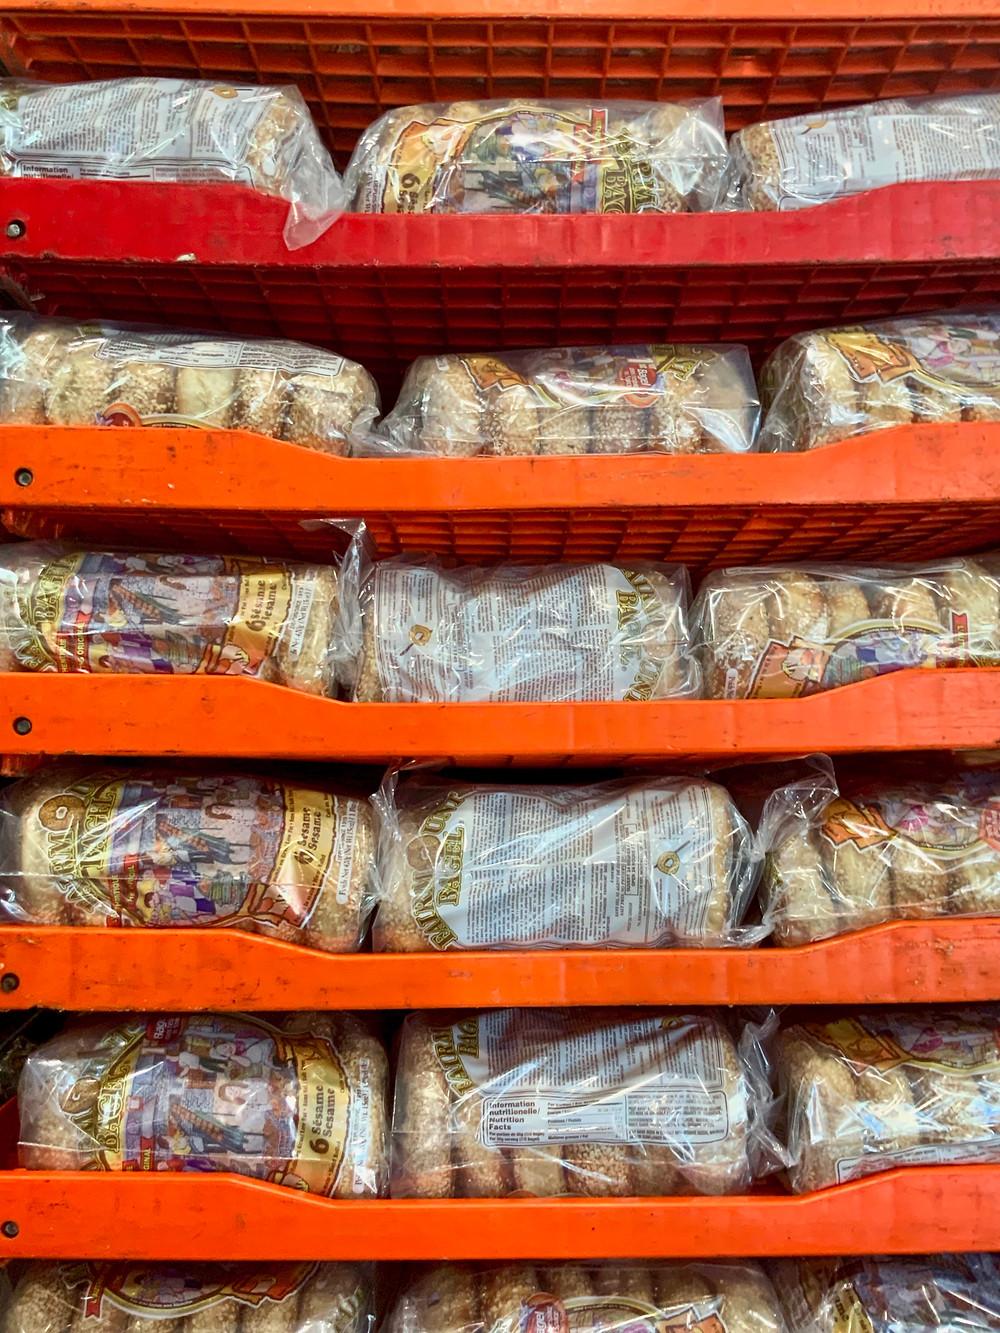 stacks of bagels for sale at Fairmont Bagel